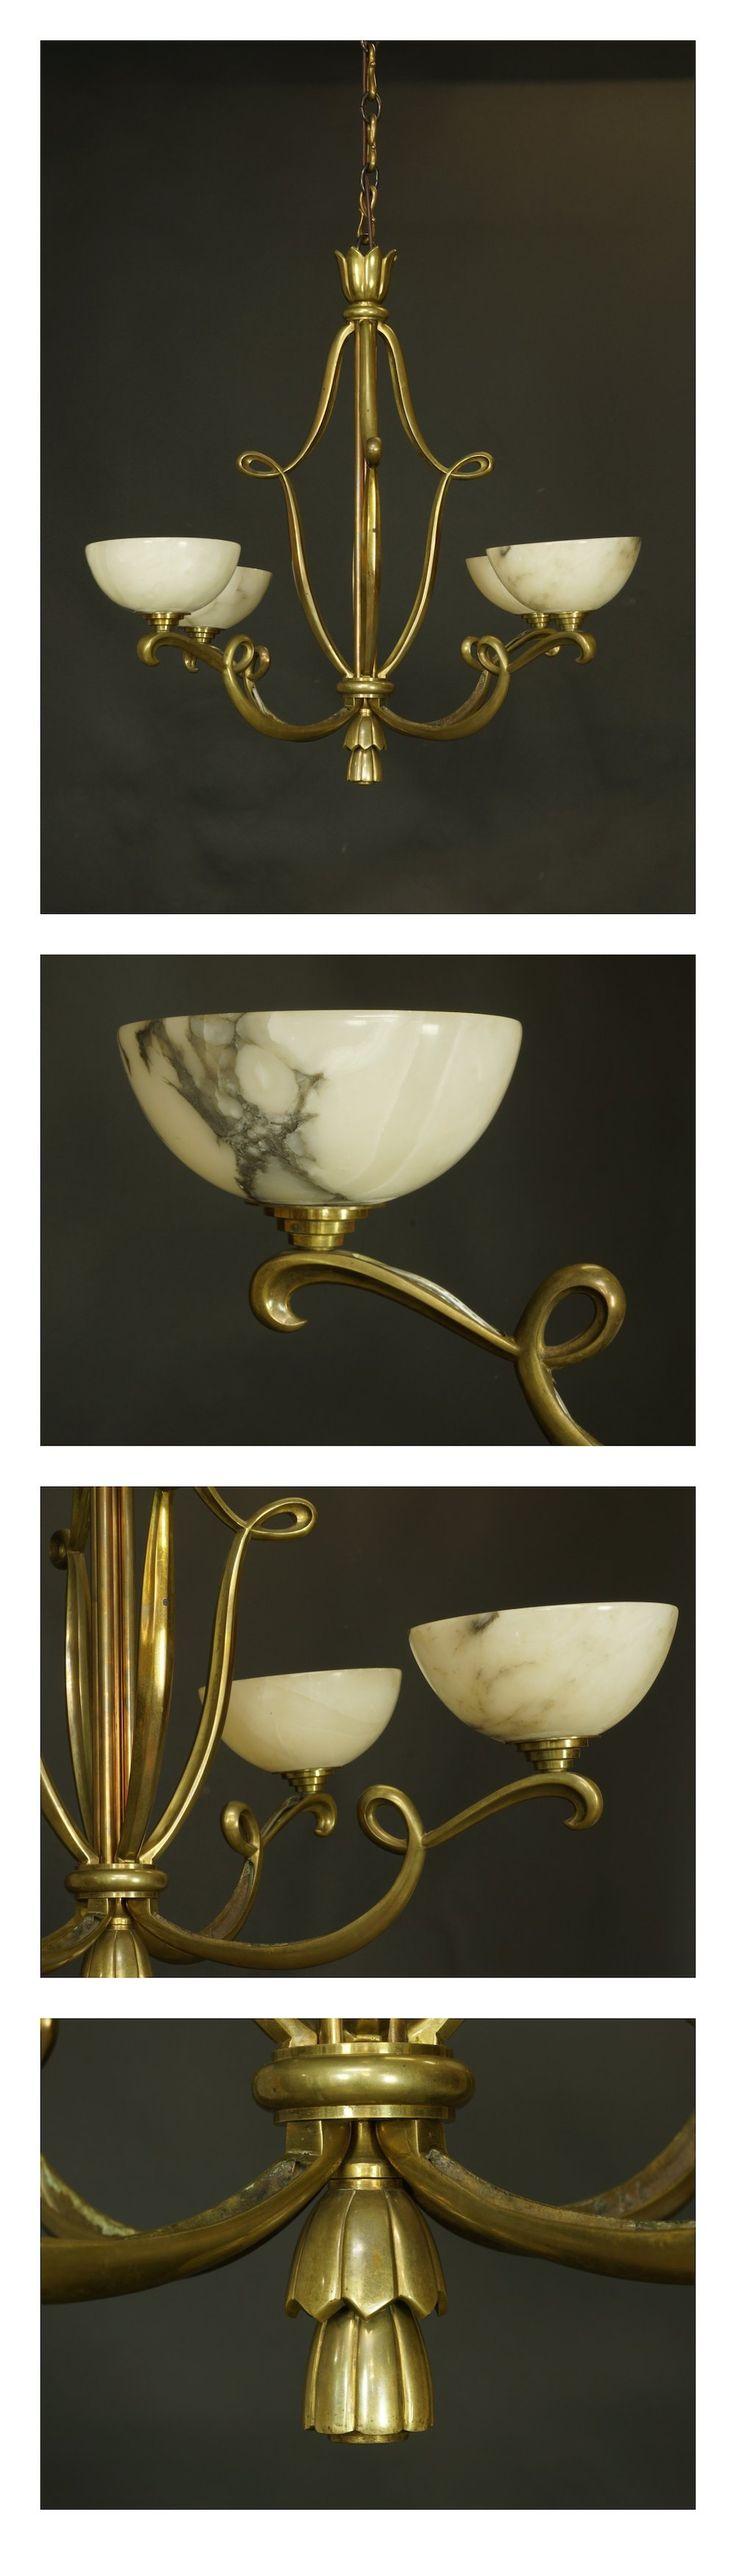 Rene Drouet Bronze and Alabaster Ceiling Light, c.1920.  #1920s #lighting